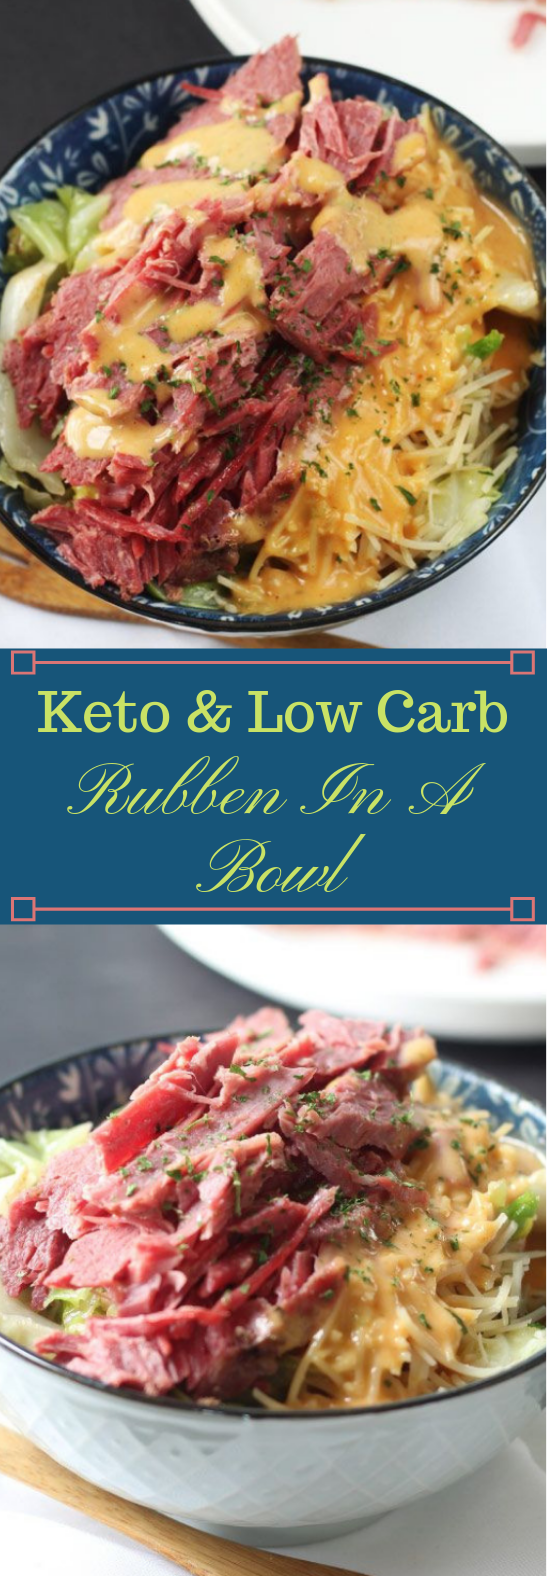 Keto & Low Carb Ruben In A Bowl #dietketo #healthyrecipes #lowcarb #whole30 #paleo